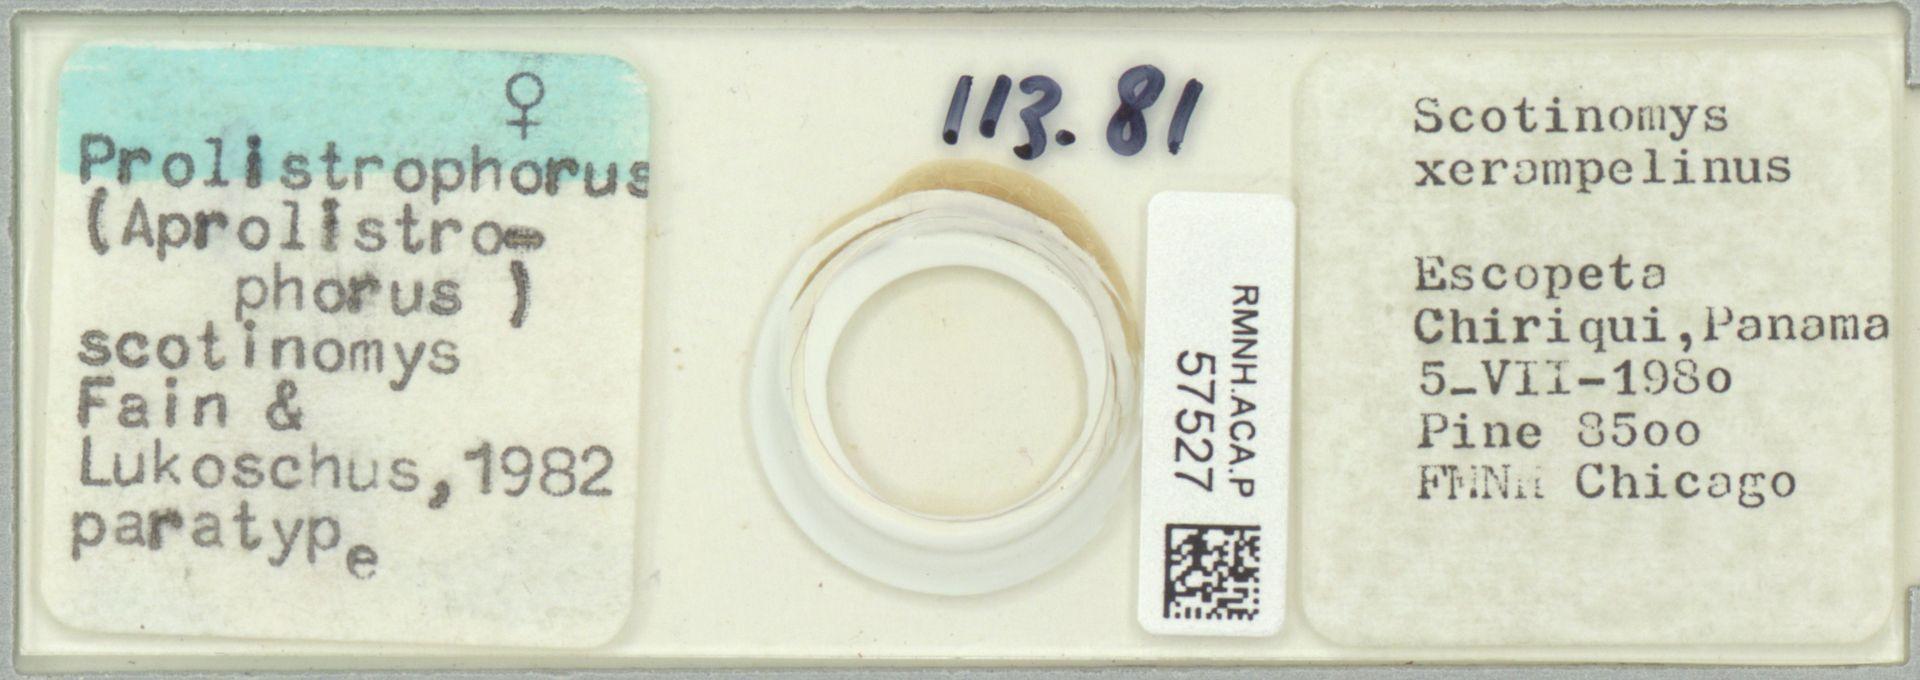 RMNH.ACA.P.57527 | Prolistrophorus (Aprolistrophorus) scotinomys Fain & Lukoschus, 1982